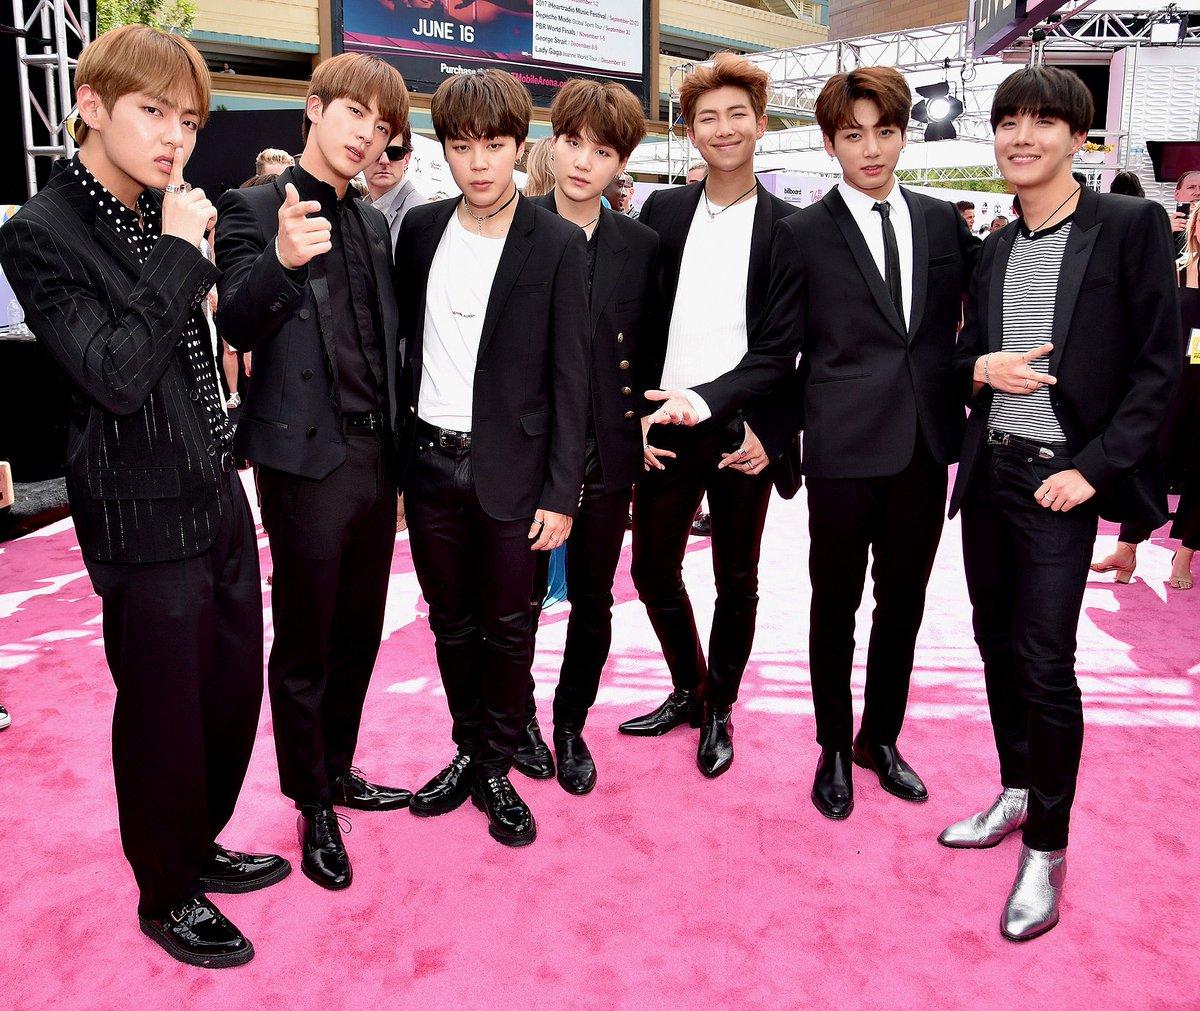 #Kpop band #BTS top @Time's annual list of 'next generation leaders'  https://t.co/U0AK7SetwI @bts_bighit